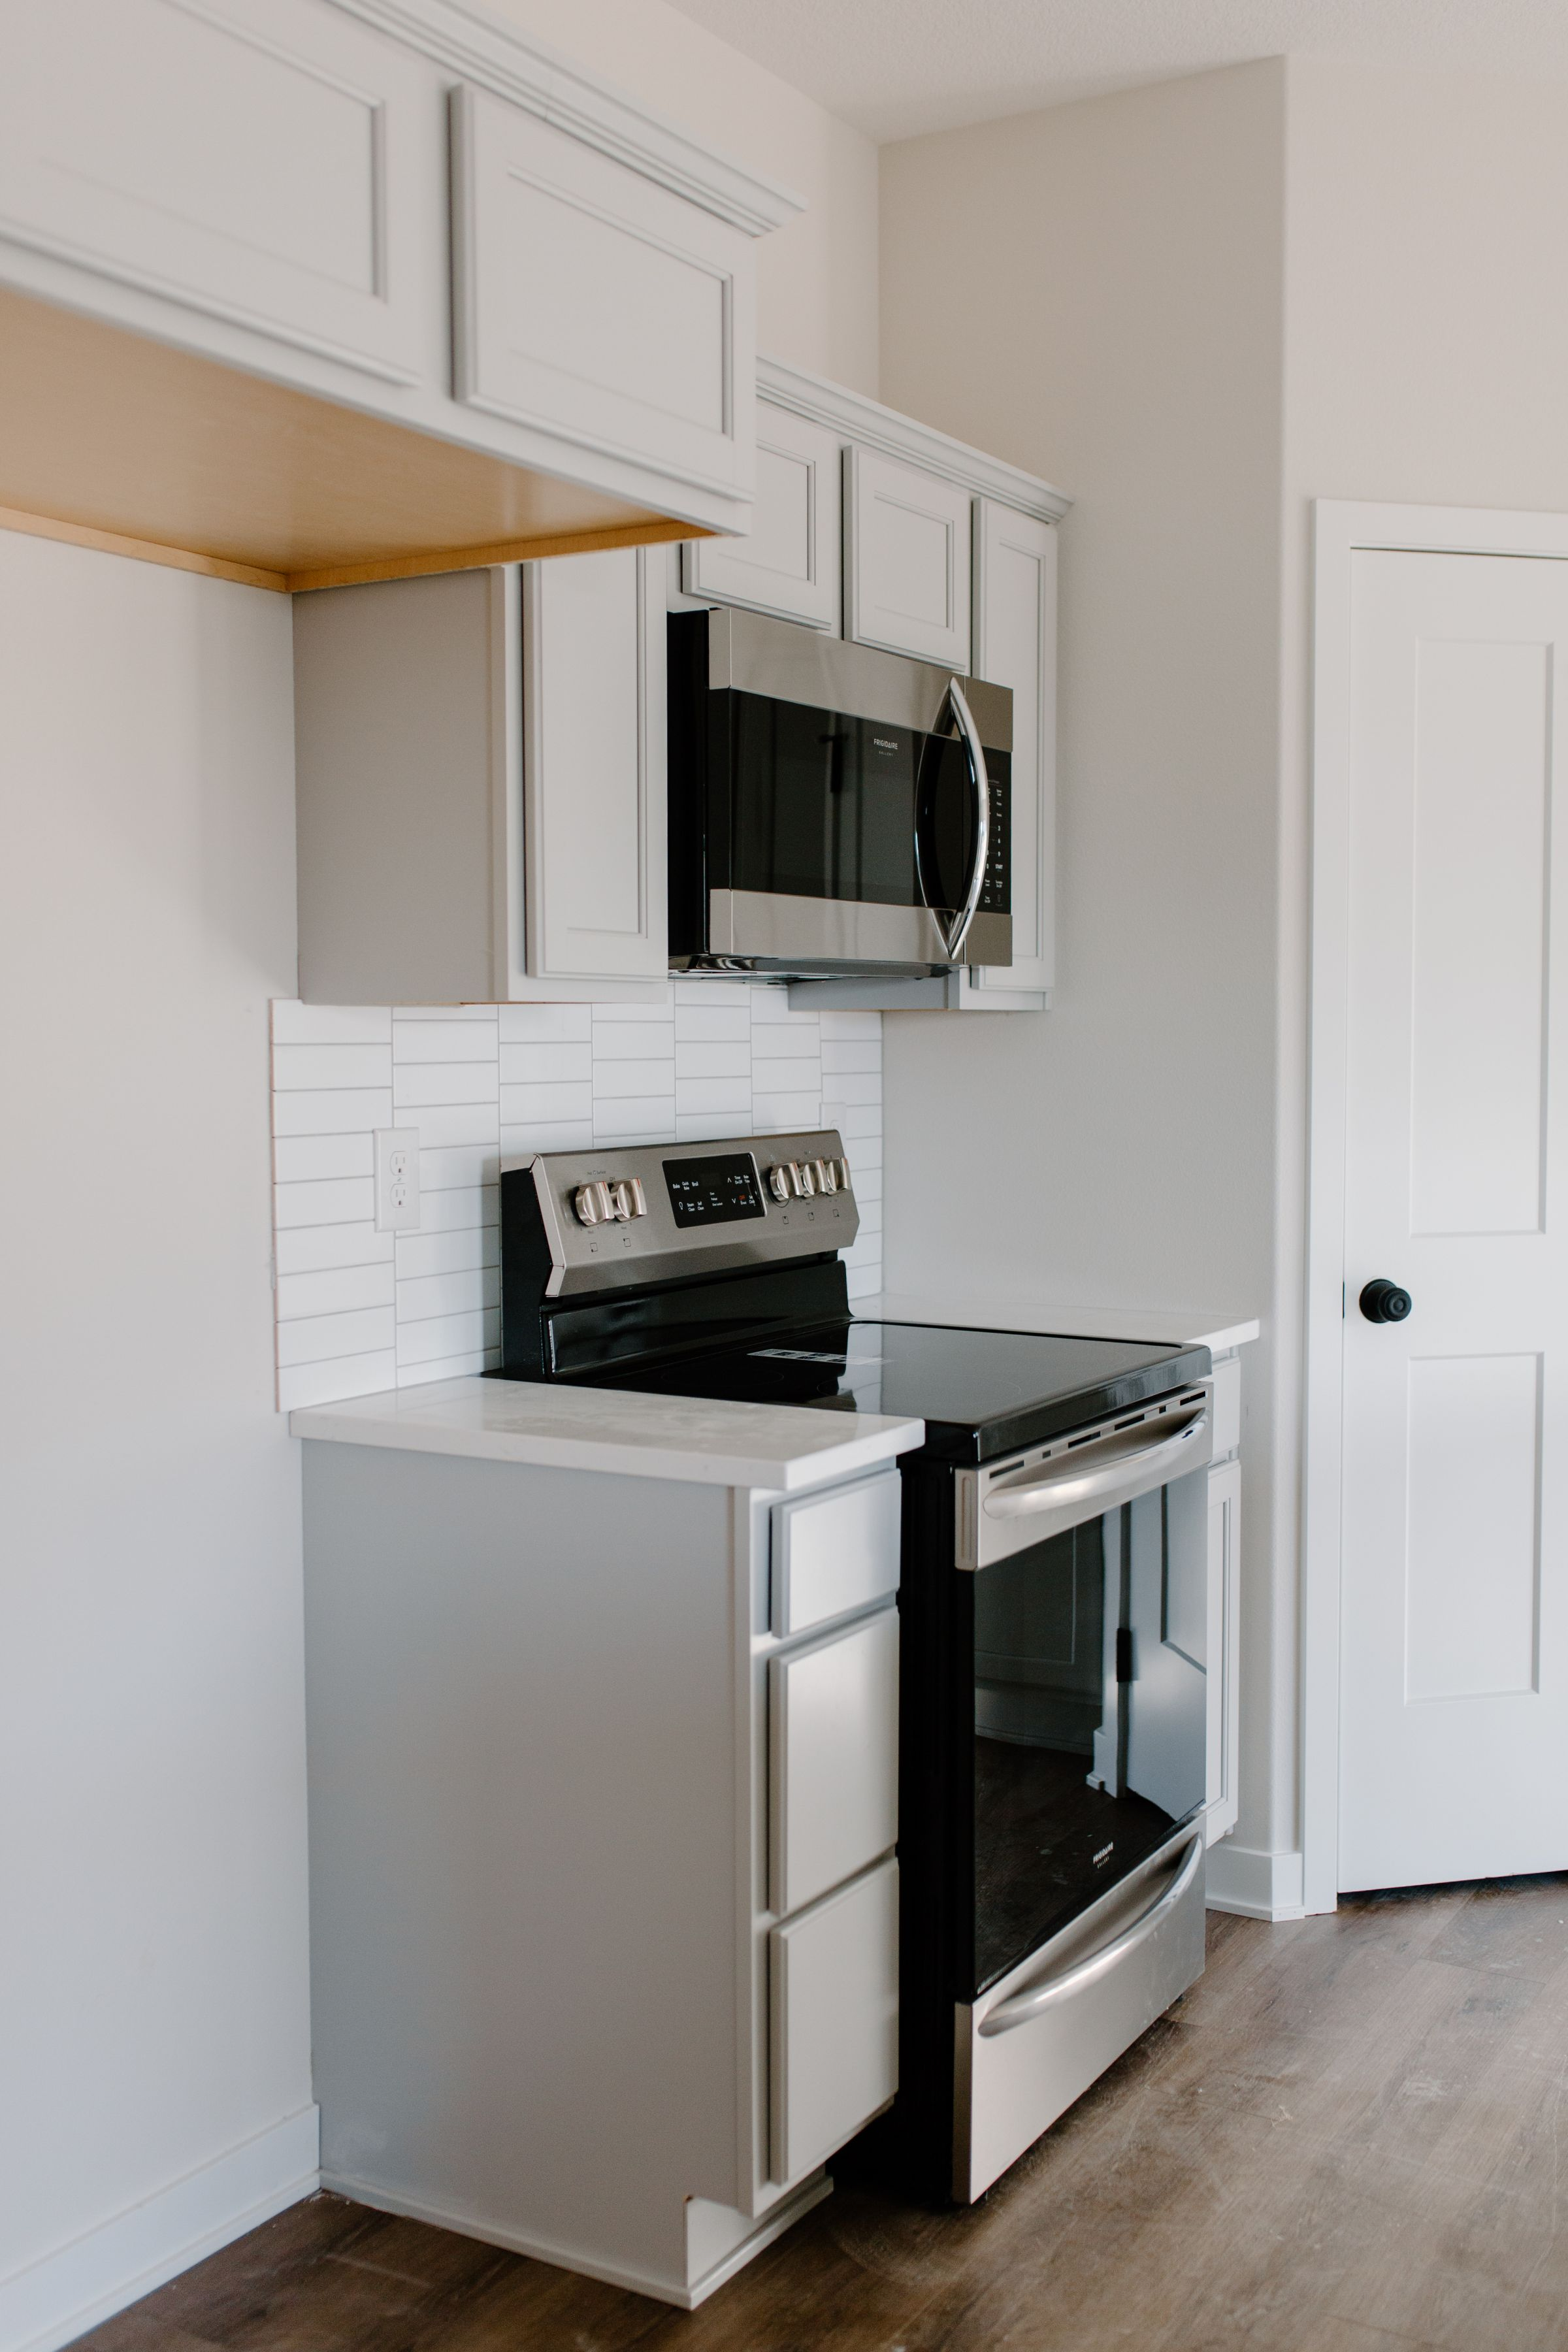 residential-warren-county-iowa-0-acres-listing-number-15138-2-2020-12-28-170544.jpg